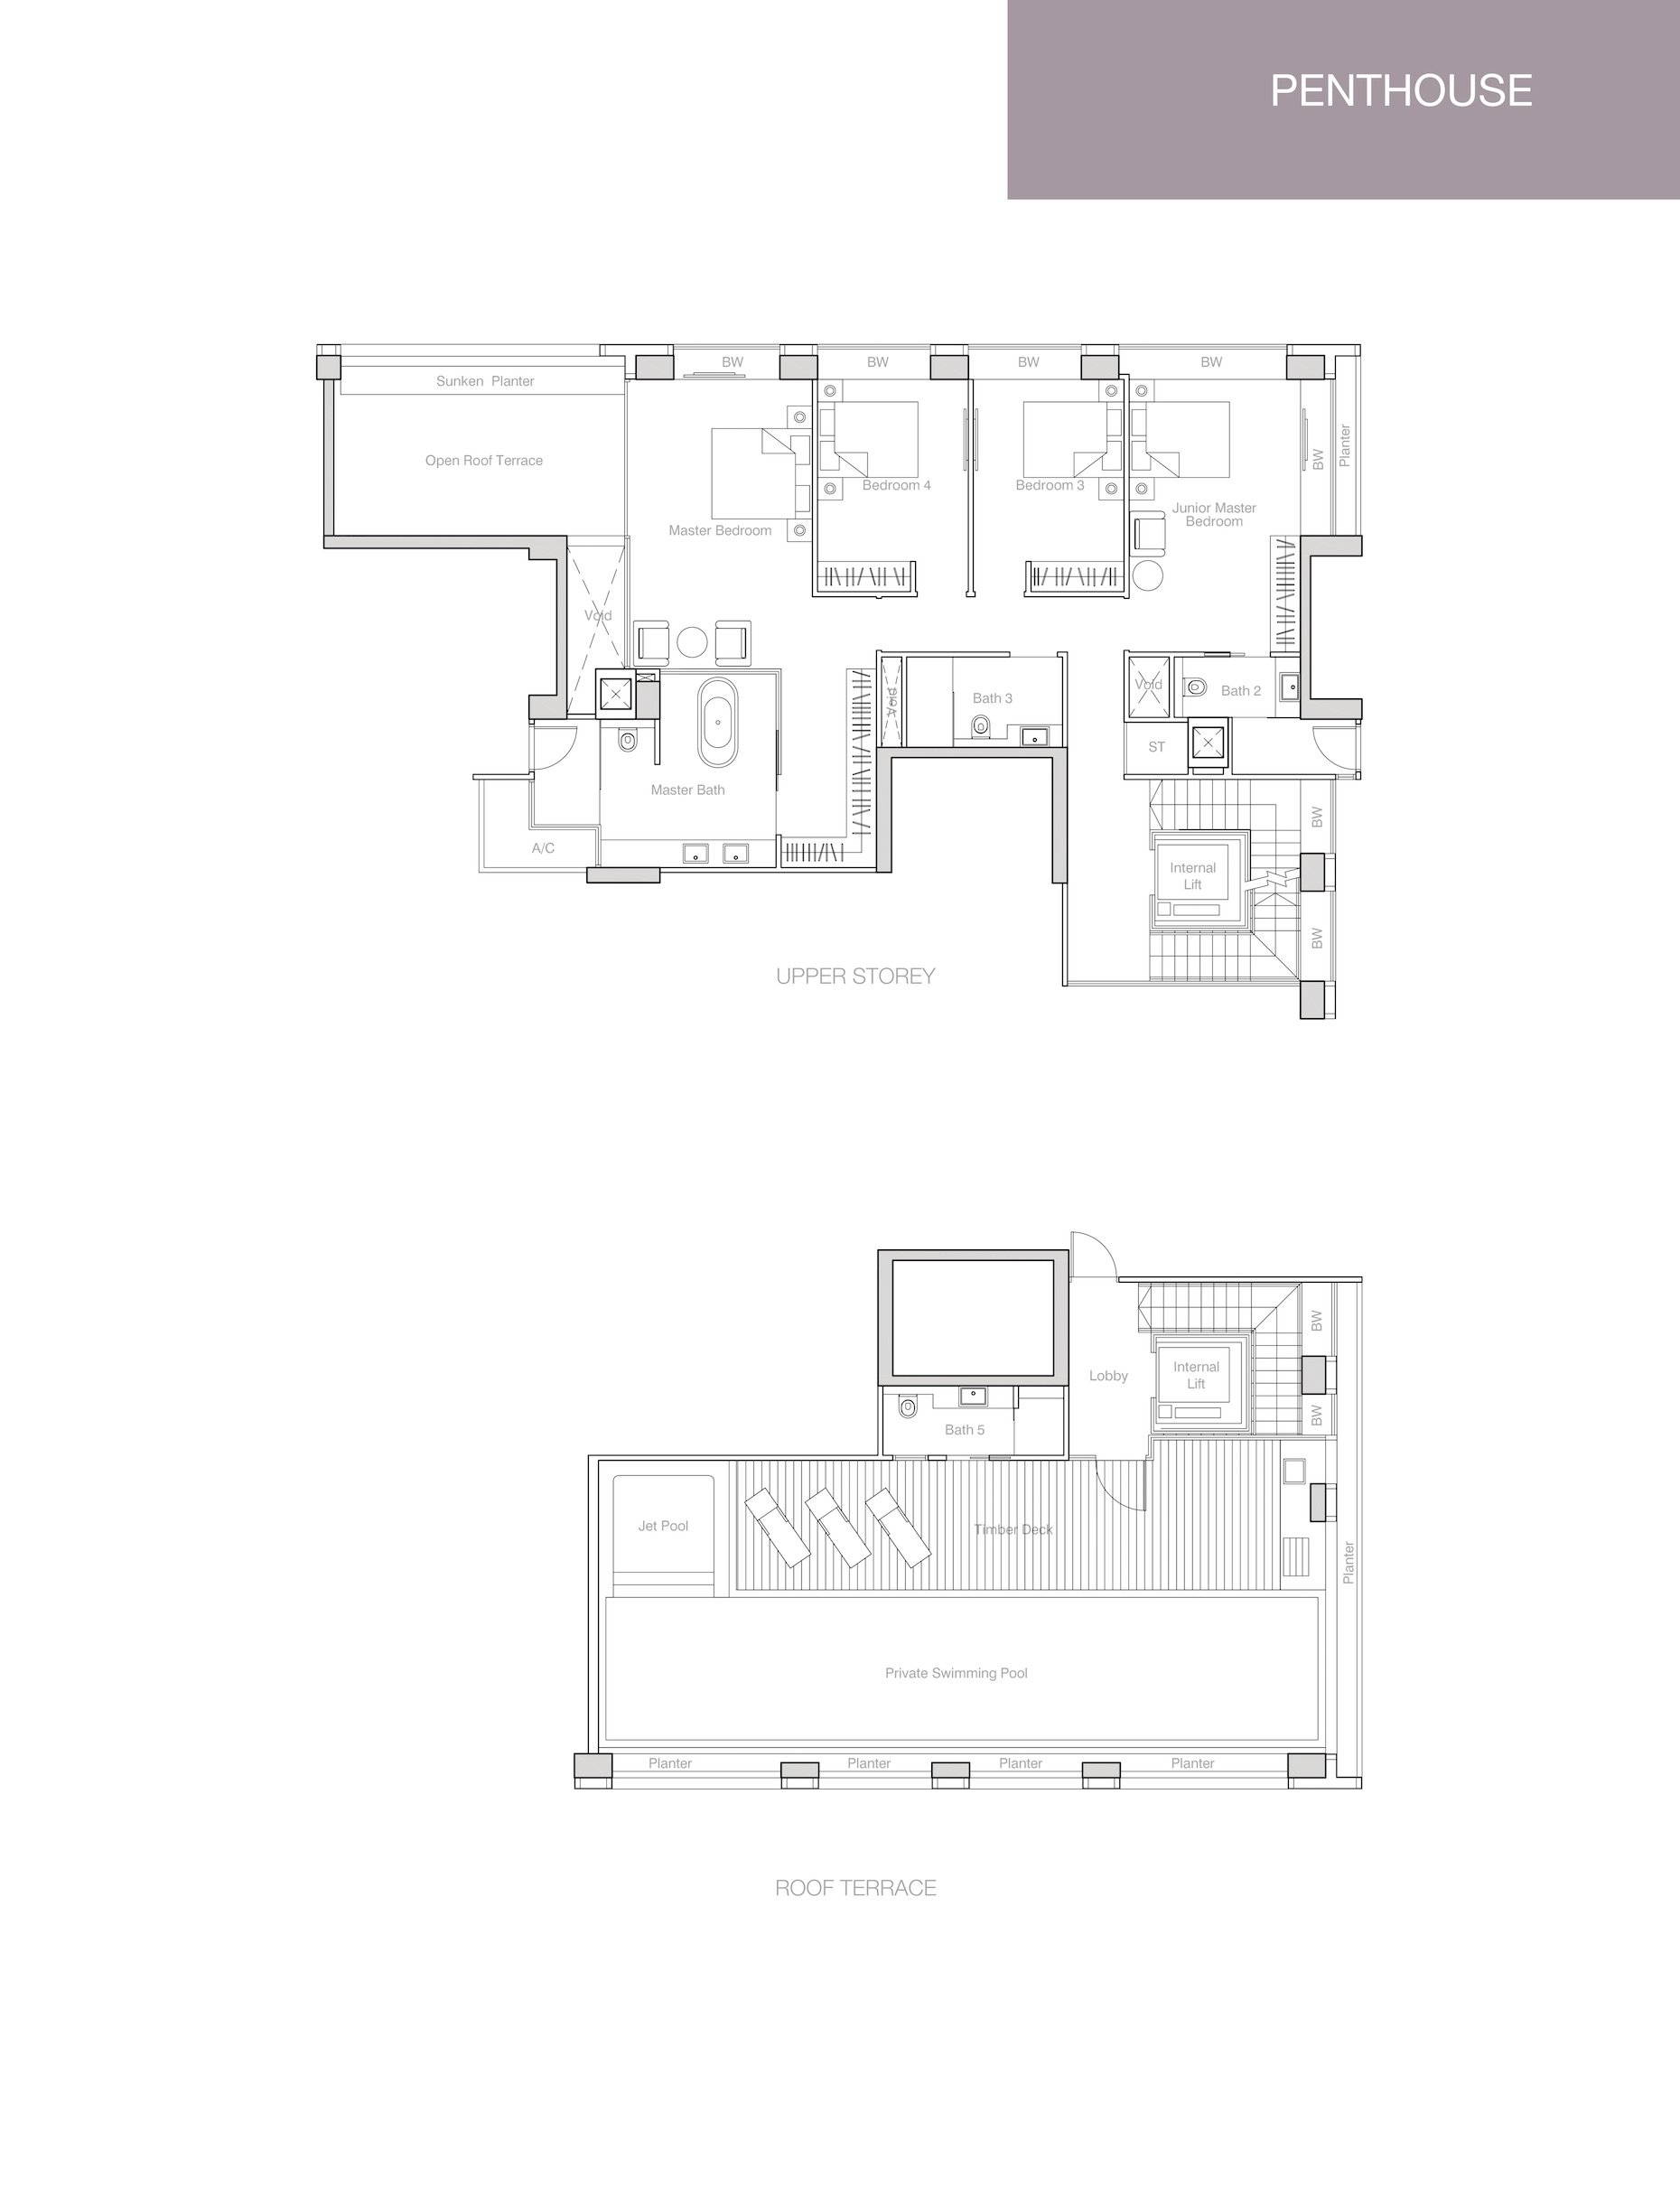 Nouvel 18 明筑公寓 floor plans PH2 35-05 upper